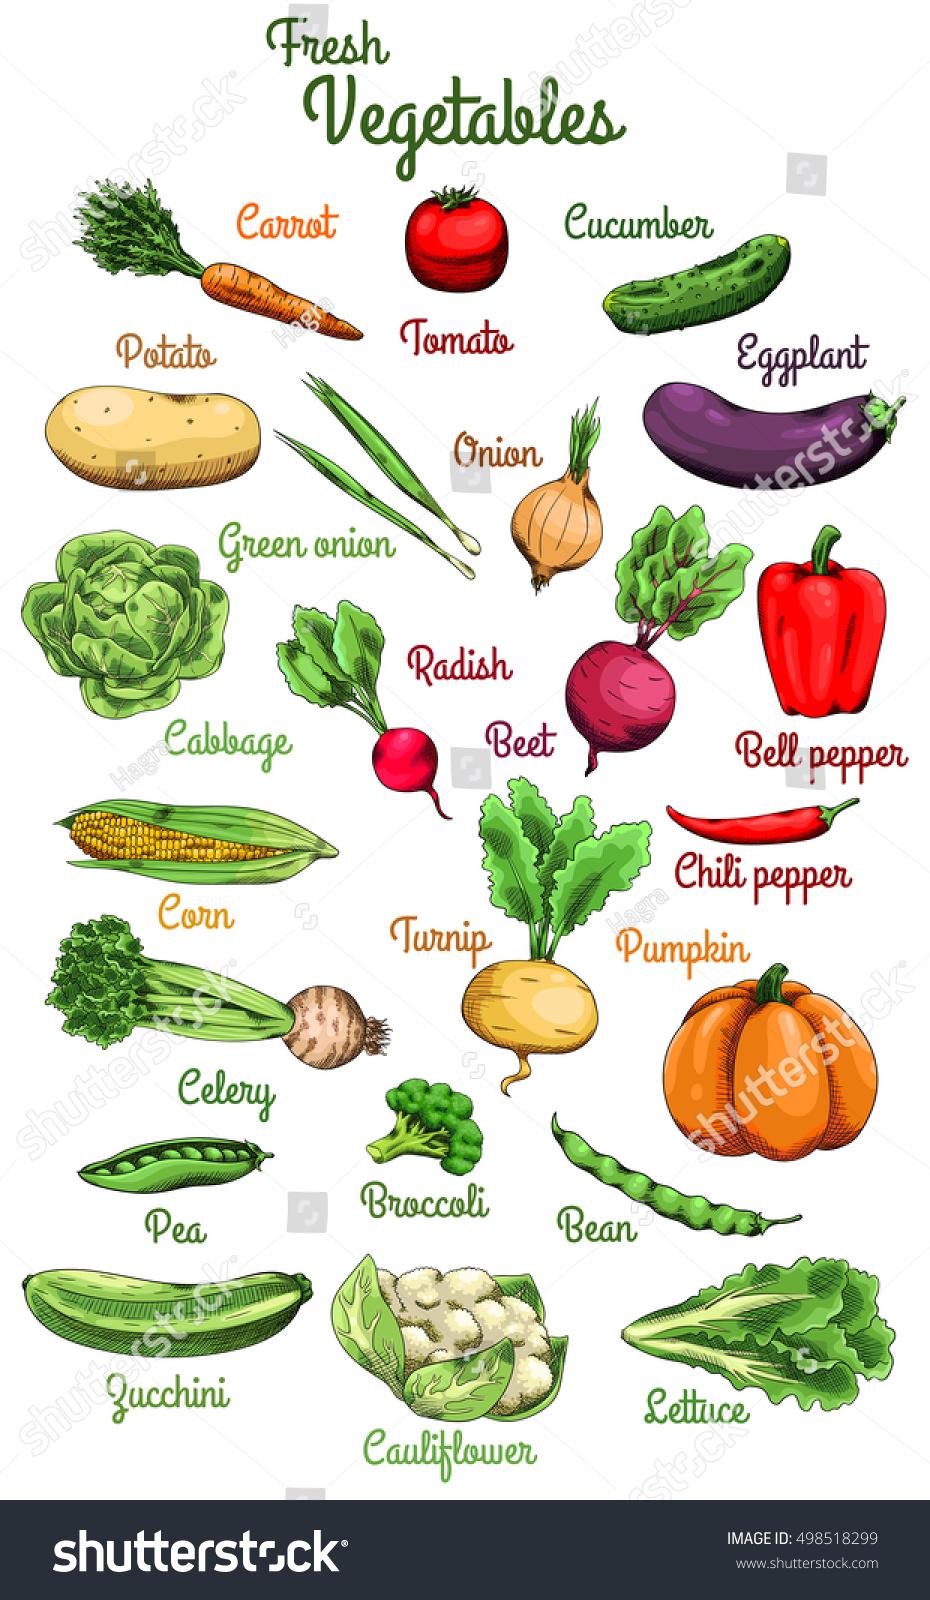 37 png Clipart files Instant Download watermelon fruit vegetable pepper potato tomato blueberry onion radish carrot FARMER/'S MARKET Clipart